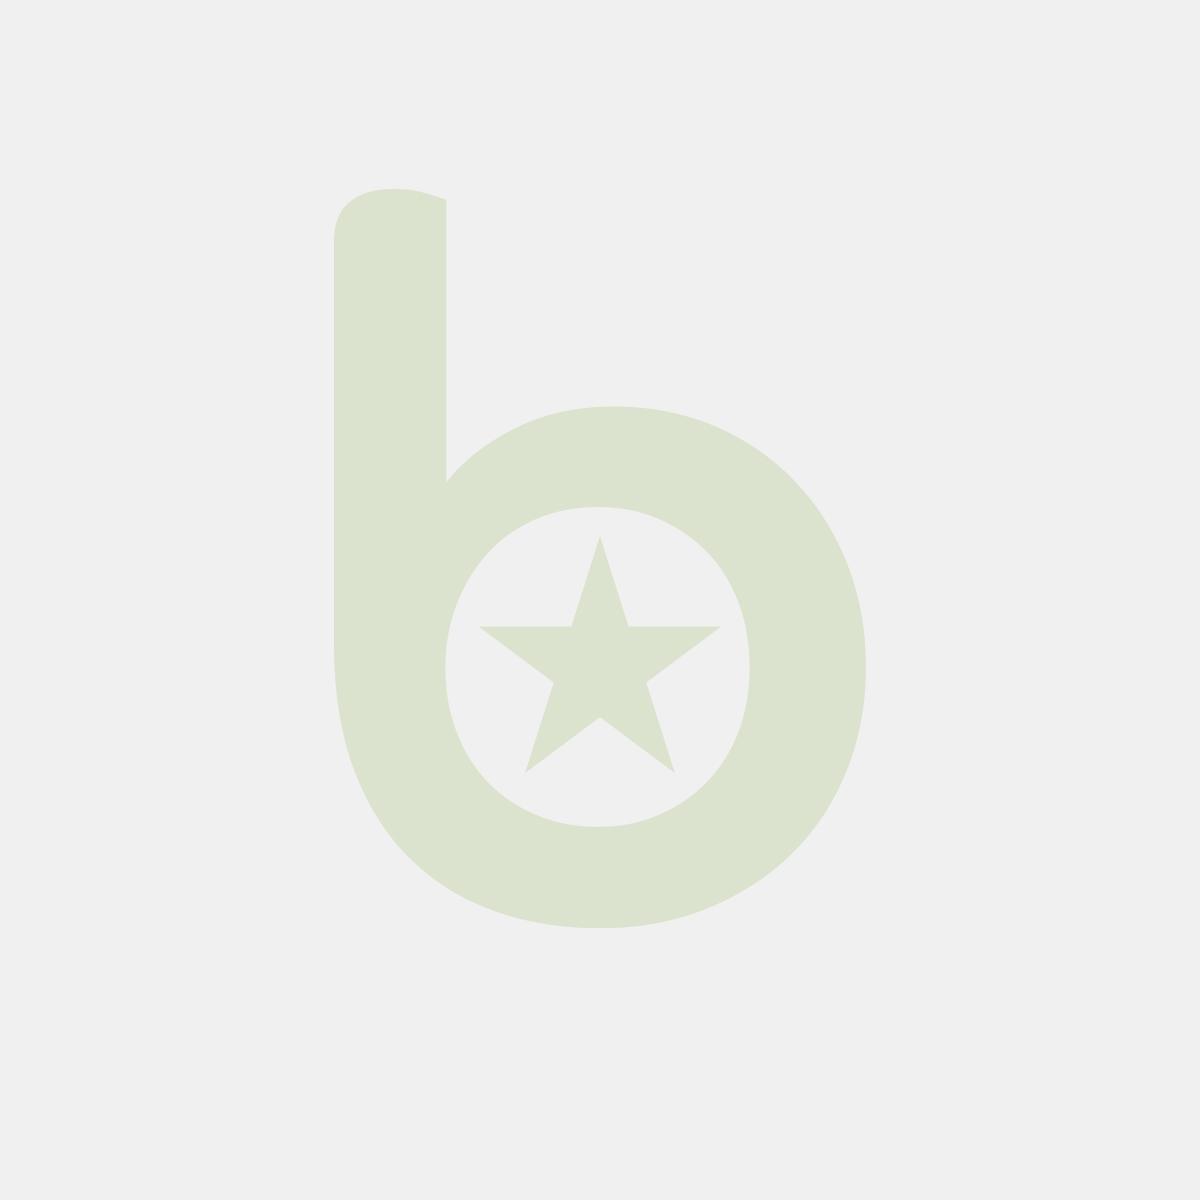 Serwetki PAPSTAR Royal Collection ORNAMENTS 40x40 mocca opakowanie 50szt